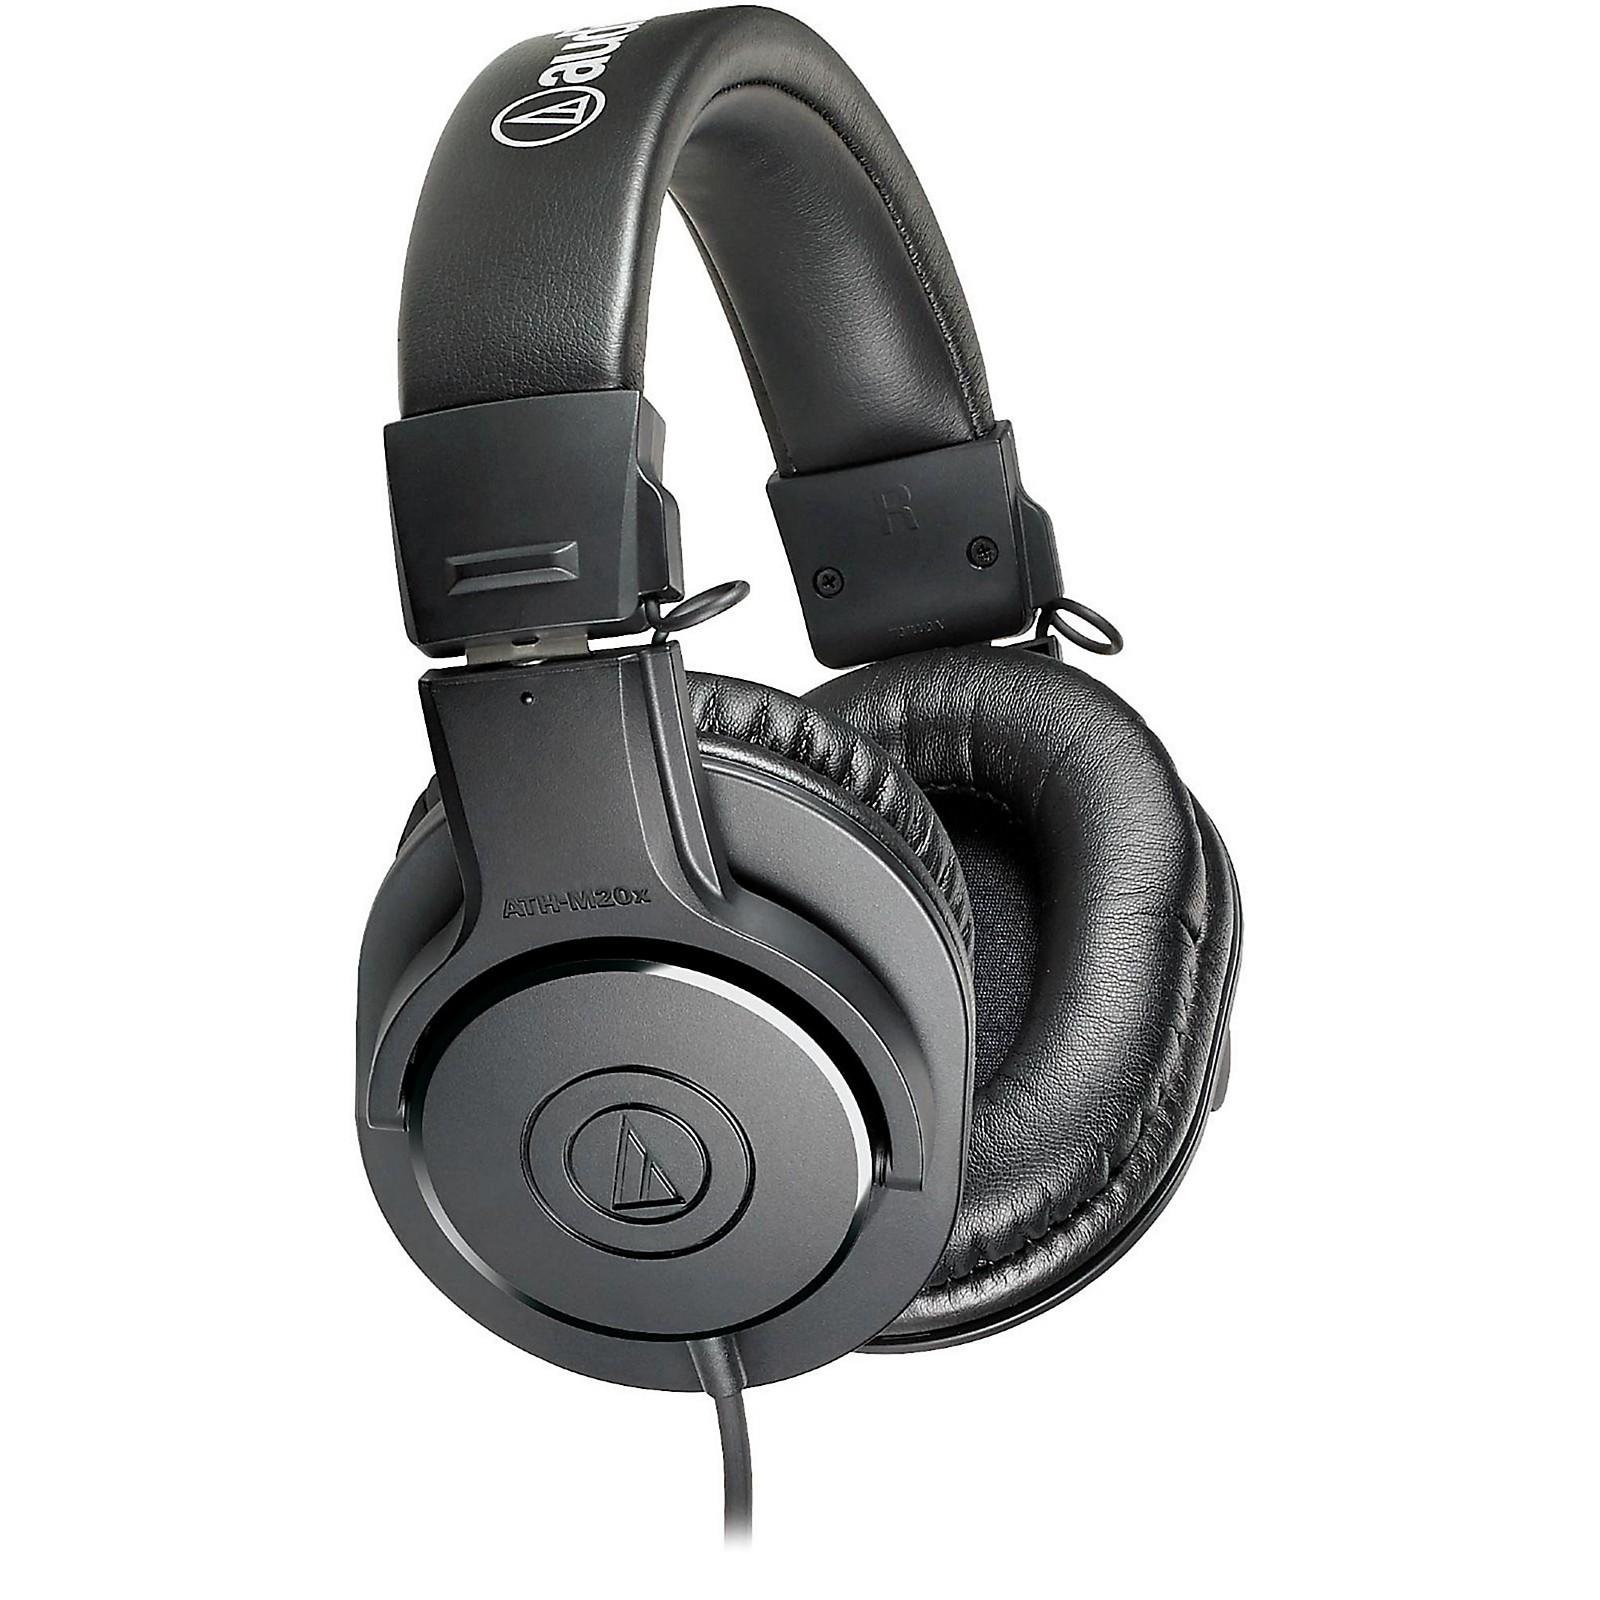 Audio-Technica ATH-M20x Closed-Back Professional Studio Monitor Headphones